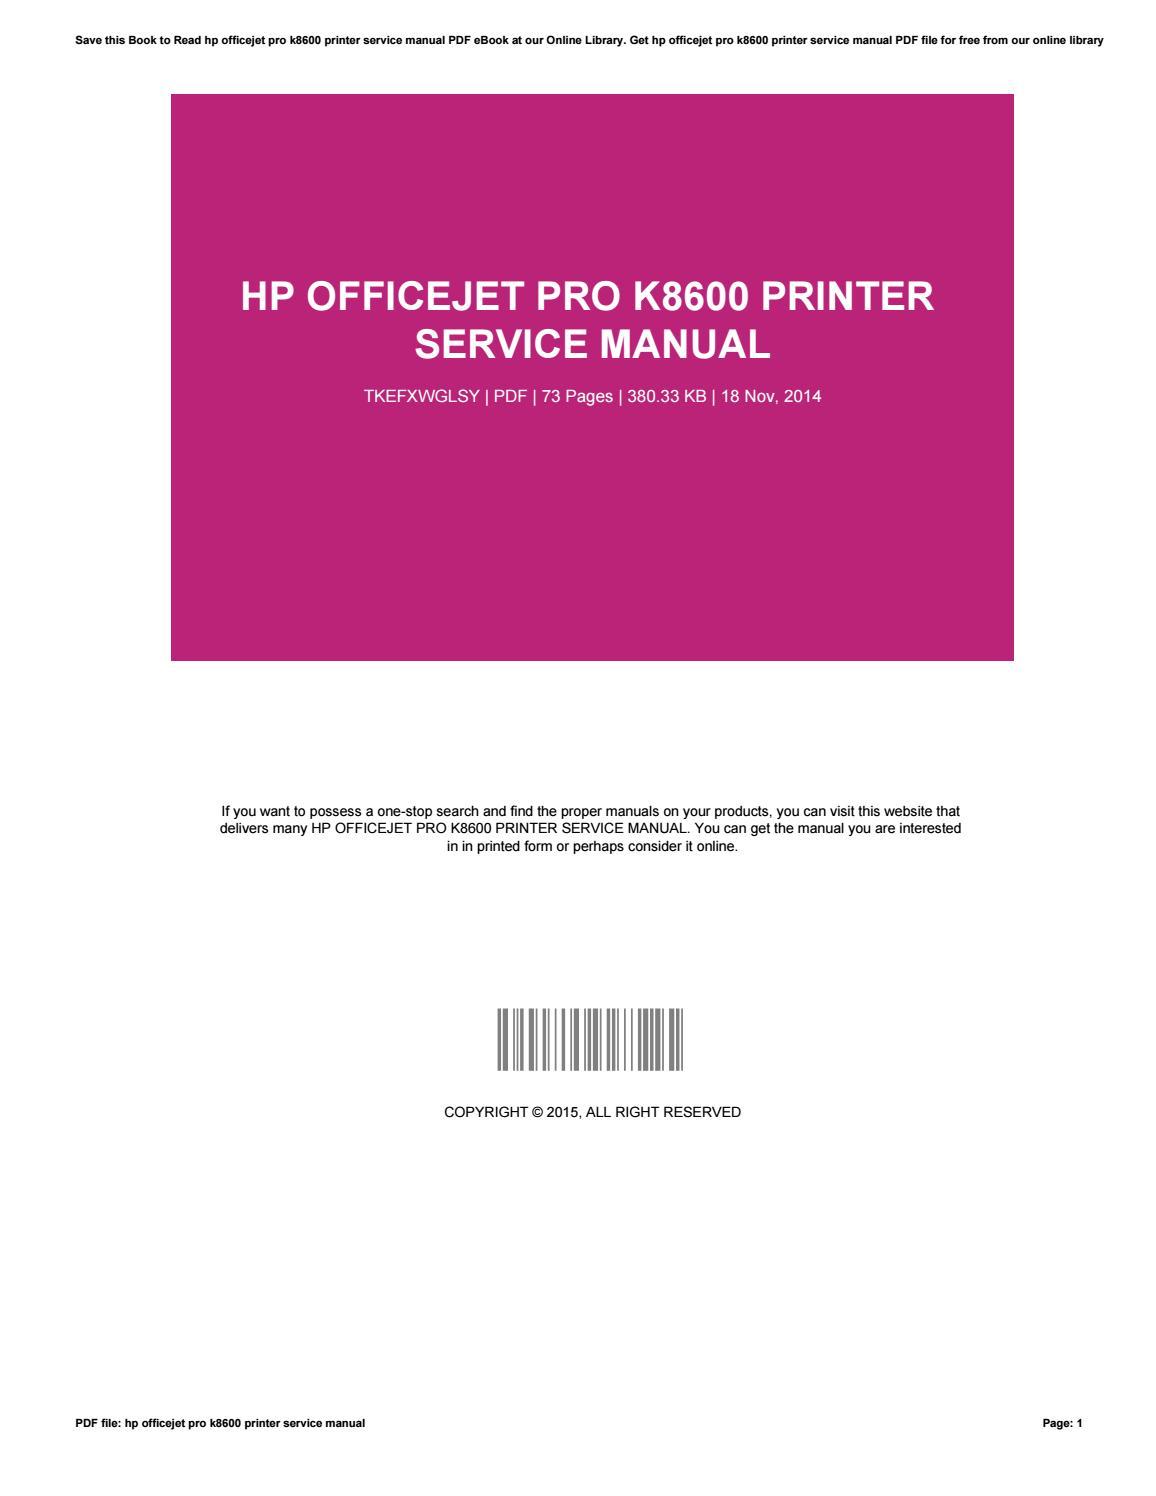 Hp officejet pro k8600 printer service manual by RandyDantzler4285 - issuu